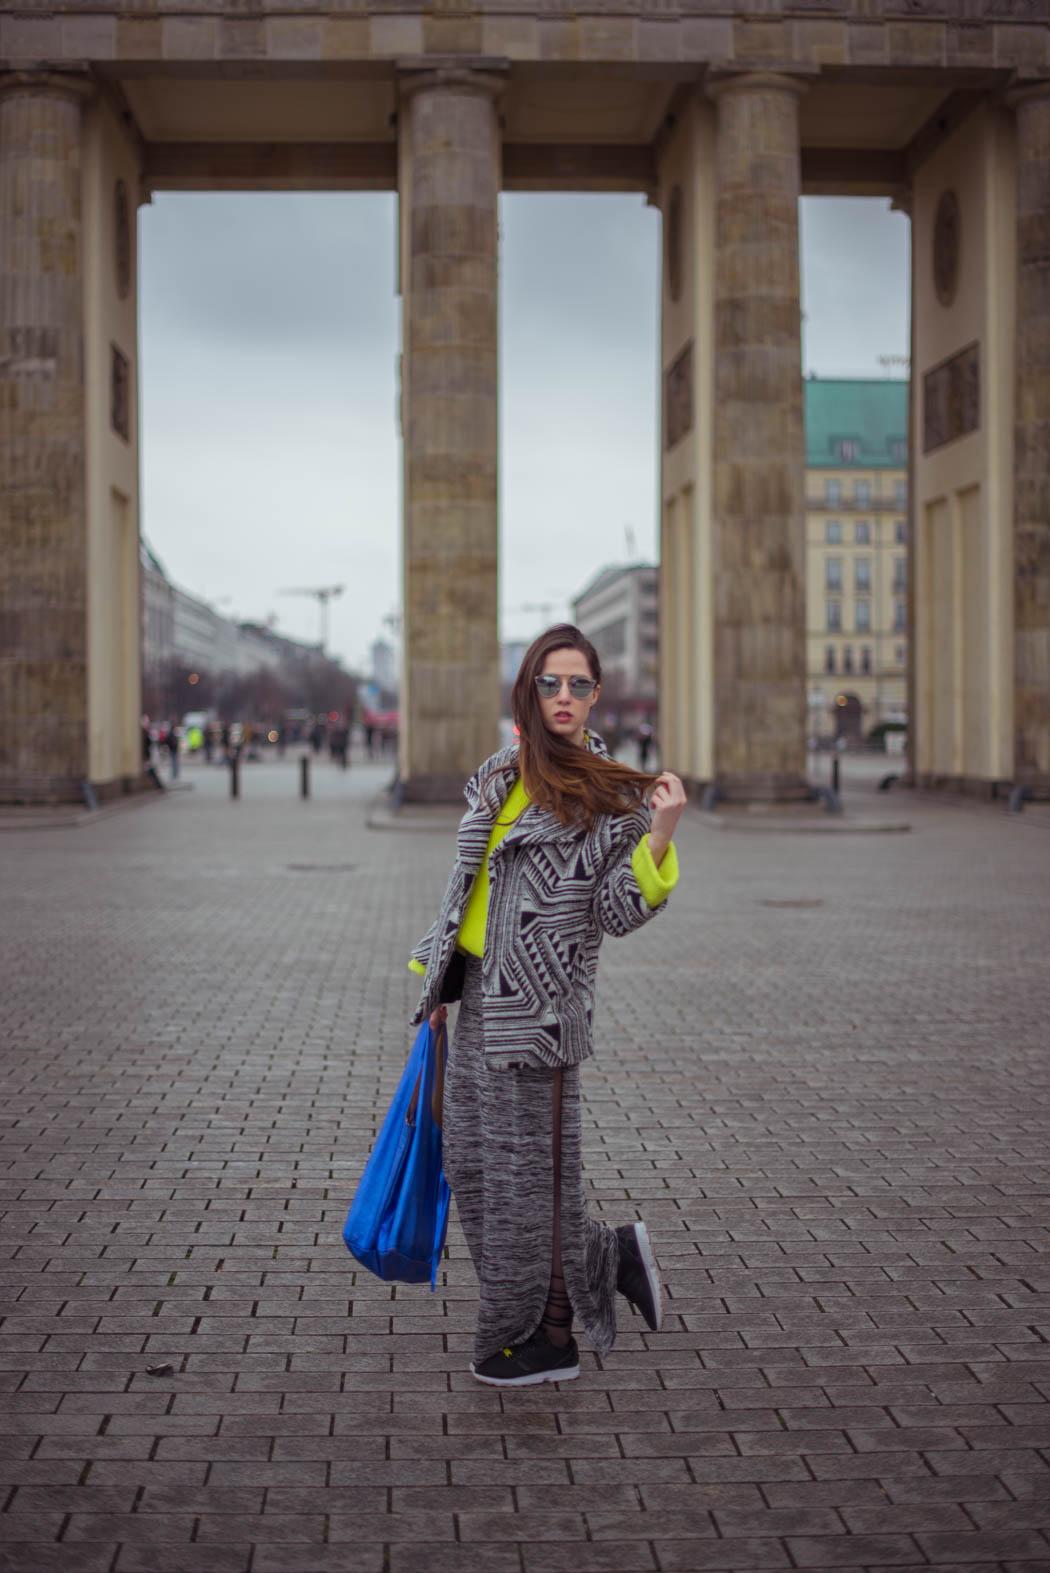 Dior-so-real-neongrüner-Pullover-Cos-Fashionblogger-München-Berlin-Deutschland-Lindarella-Streetstyle-4